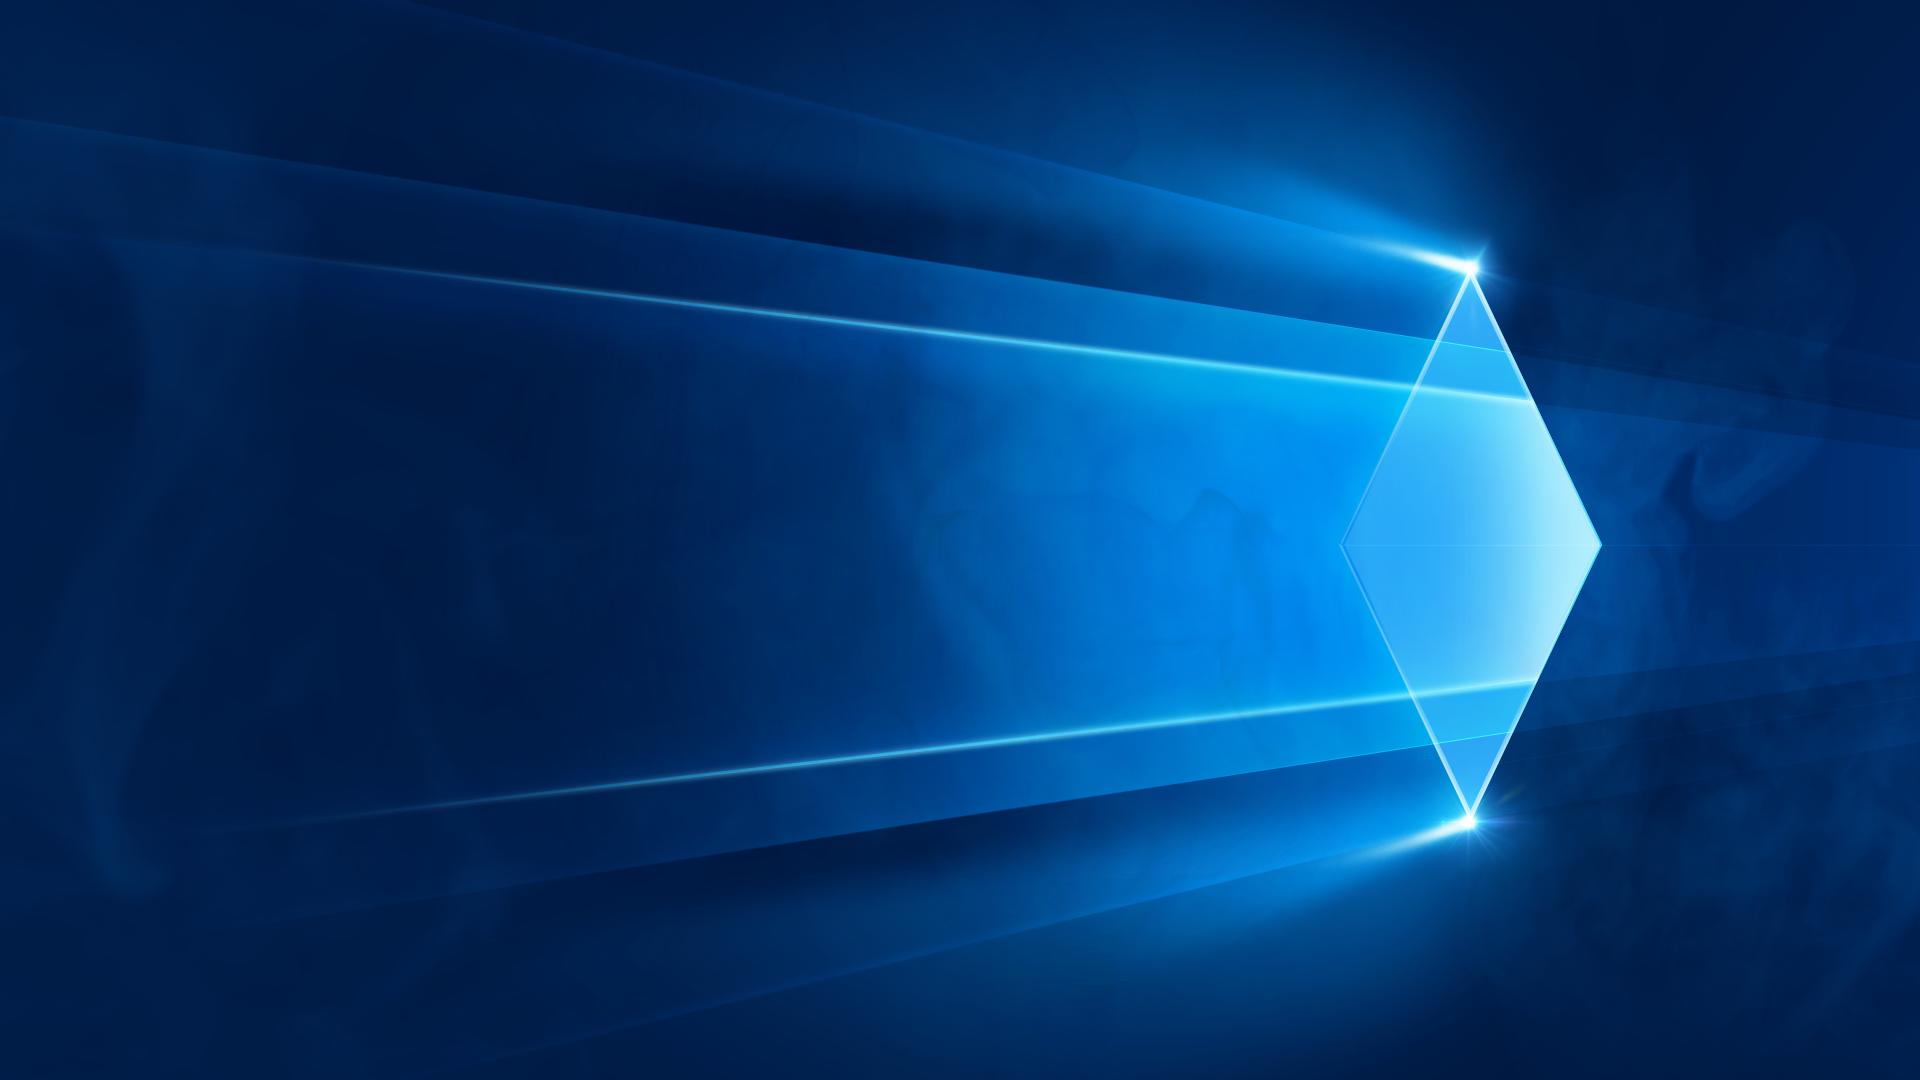 Sunlight Blue Lens Flare Windows 10 Laser The Sims Light Color Lighting Shape Line Screenshot Computer